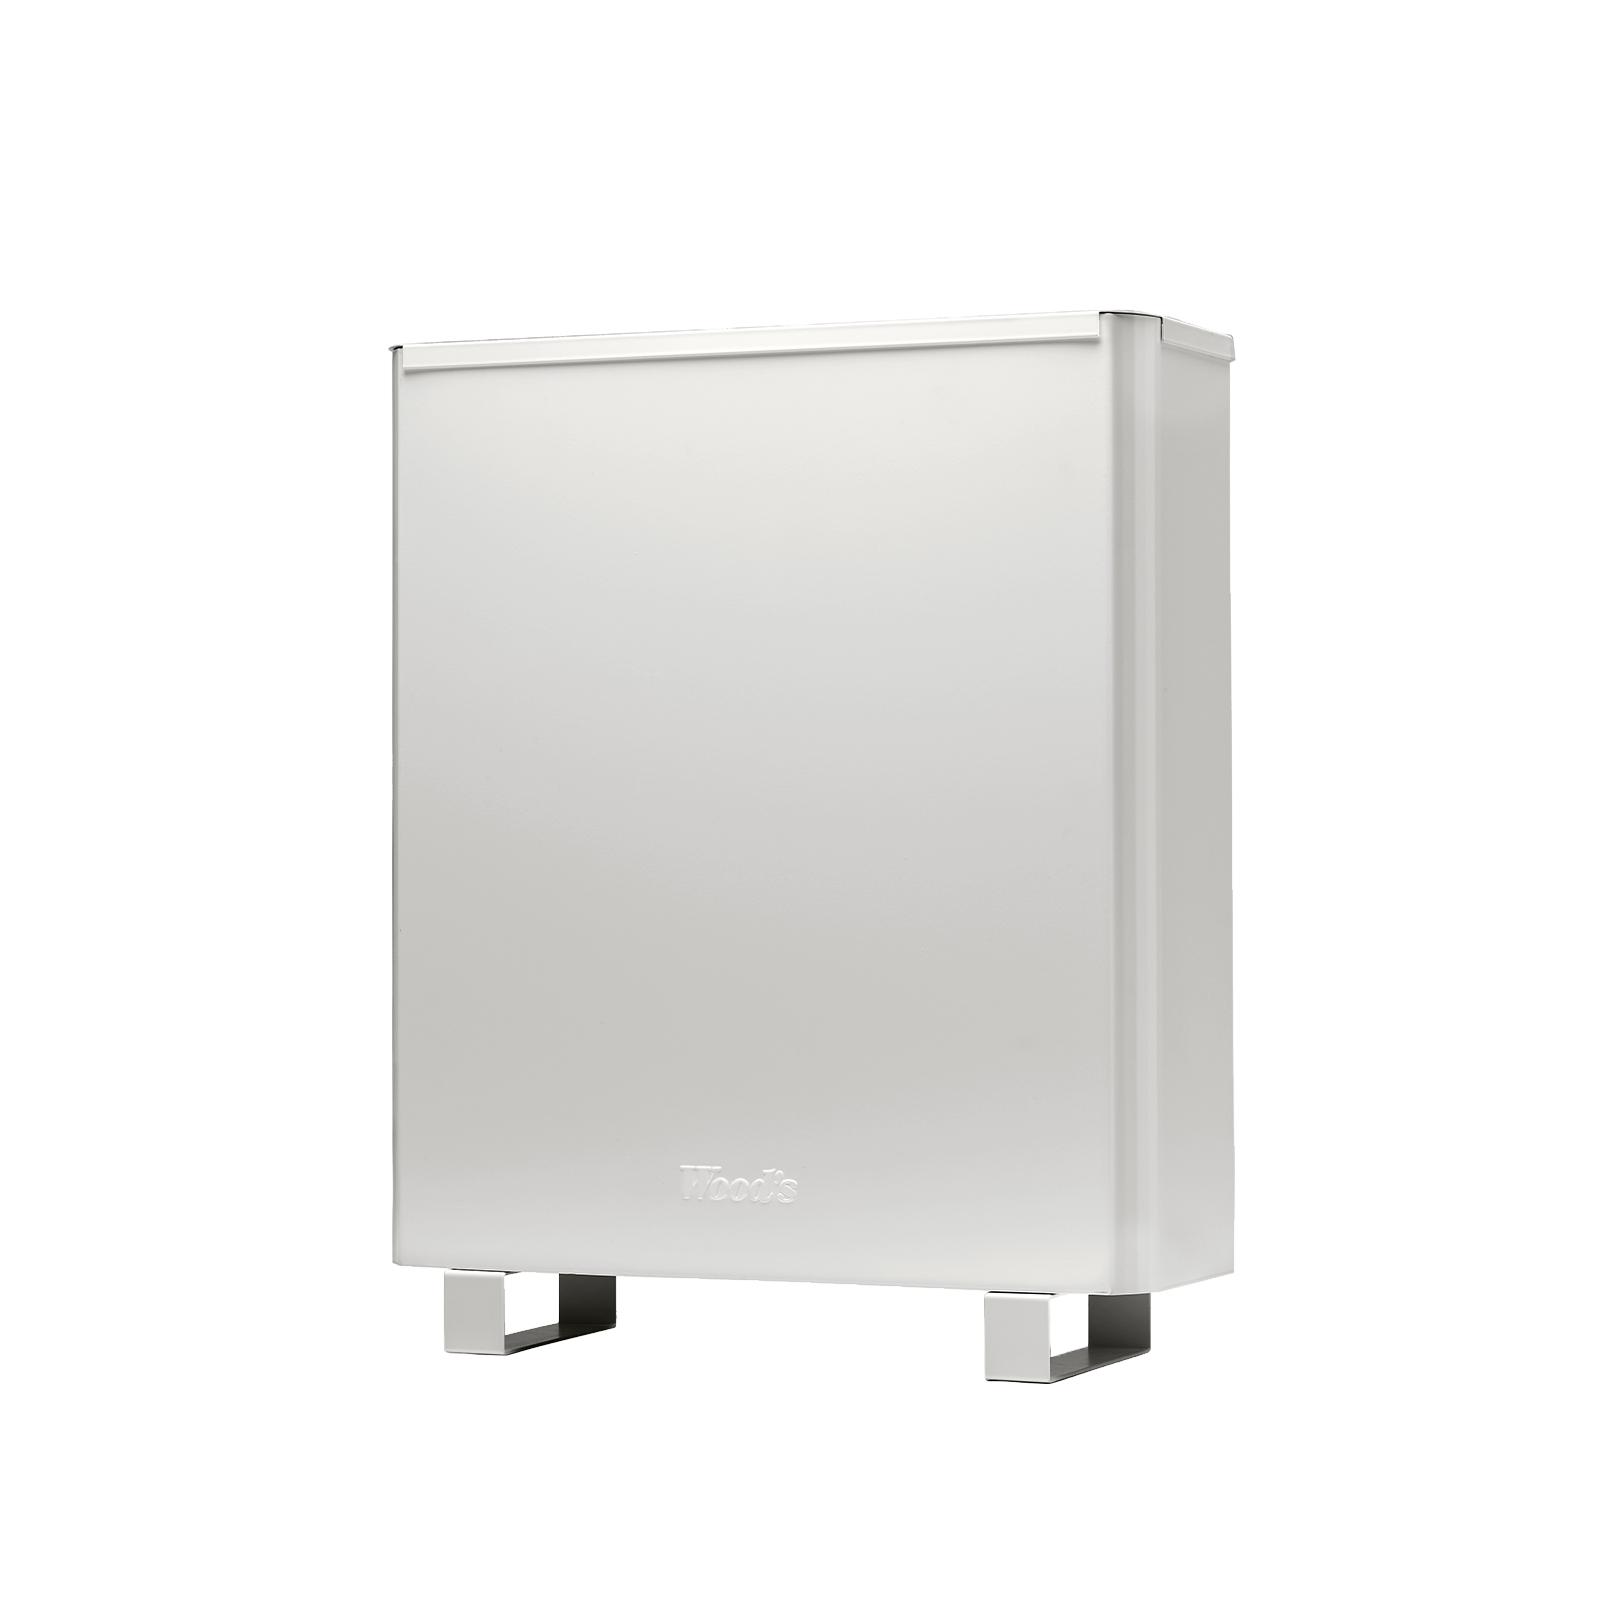 [woods旗舰店空气净化,氧吧]瑞典 Wood's 空气净化器 AL月销量0件仅售4980元